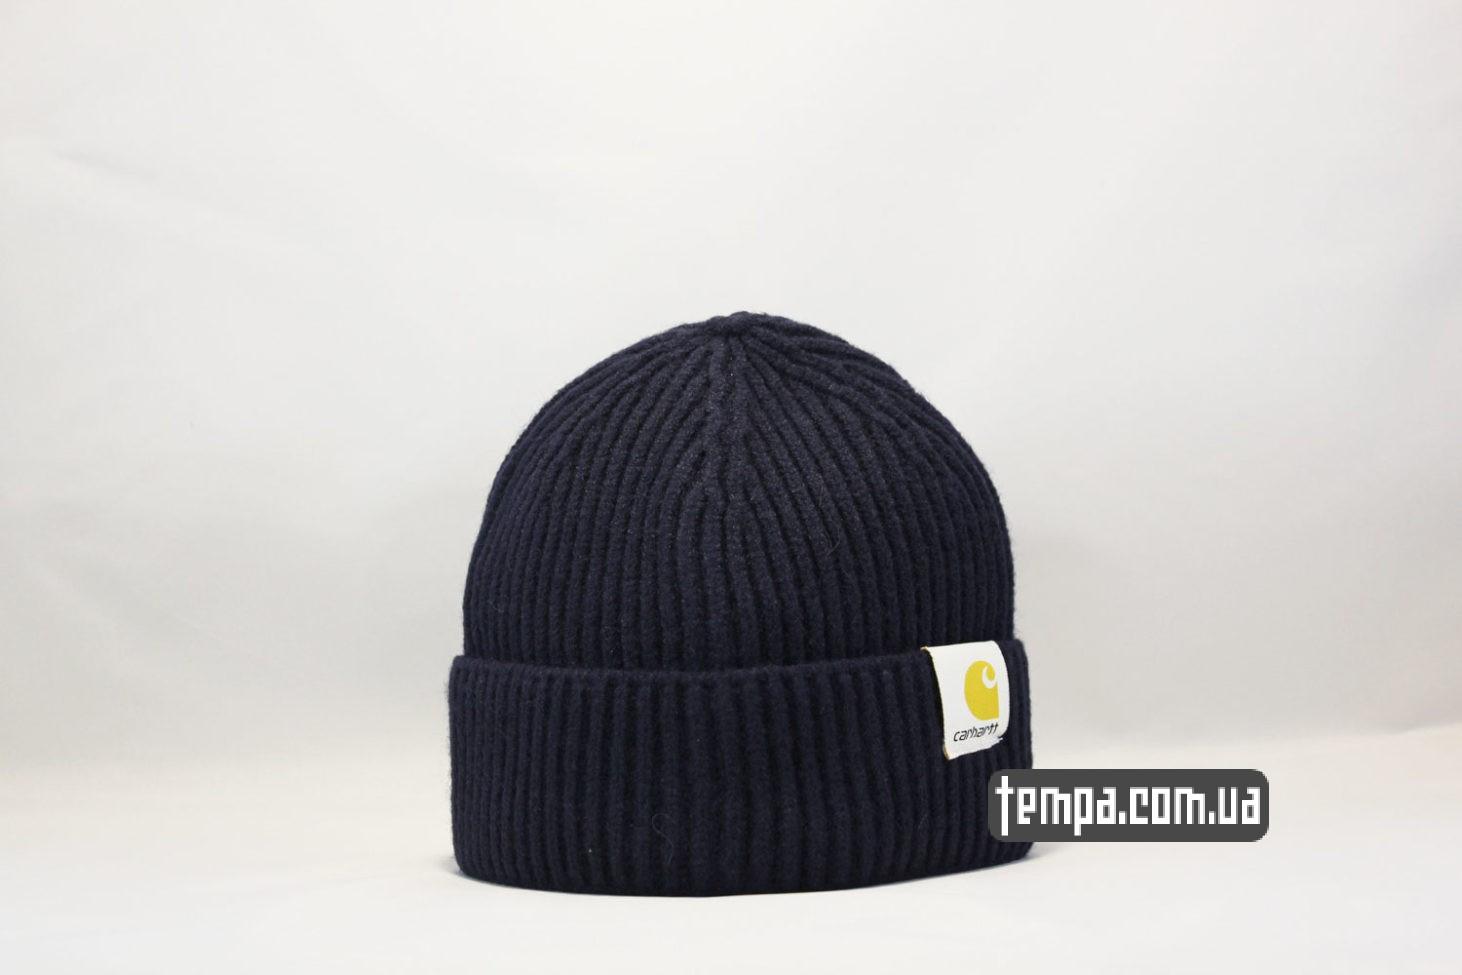 шапка beanie Carhartt Blue синяя магазин купить